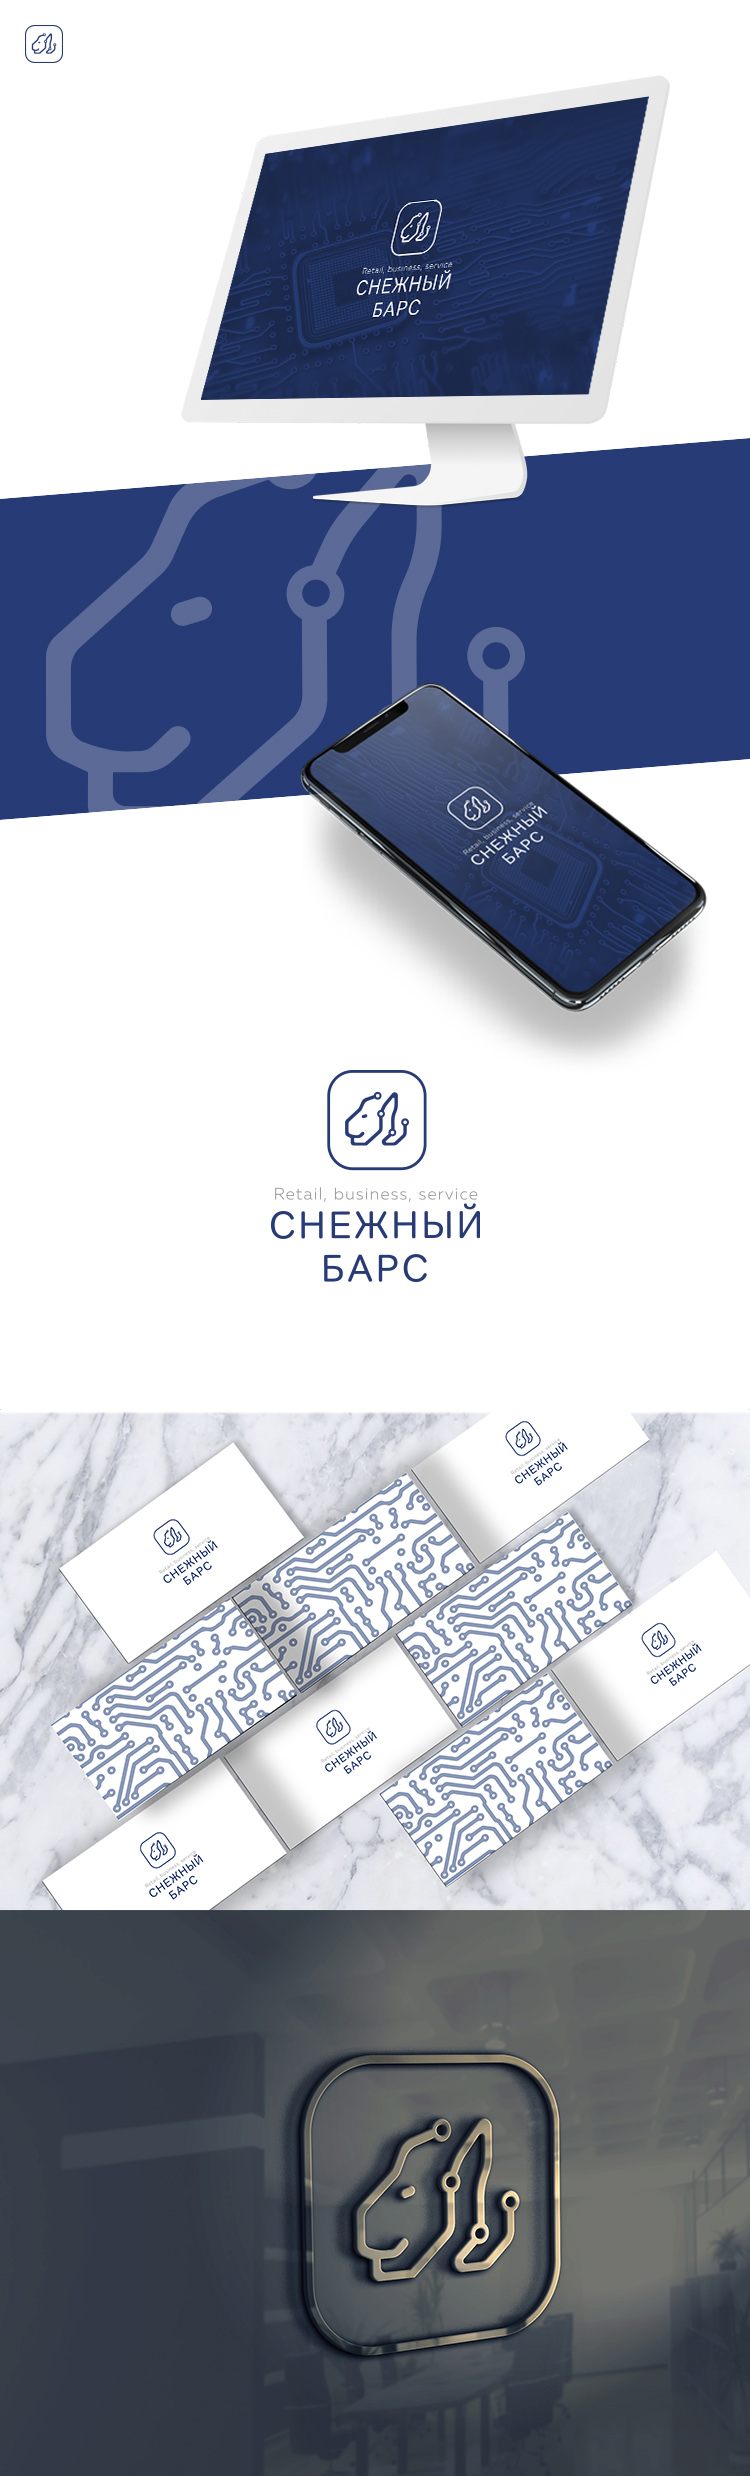 Ре-дизайн (рестайлинг) логотипа компании фото f_7875a92ce0769fa3.jpg